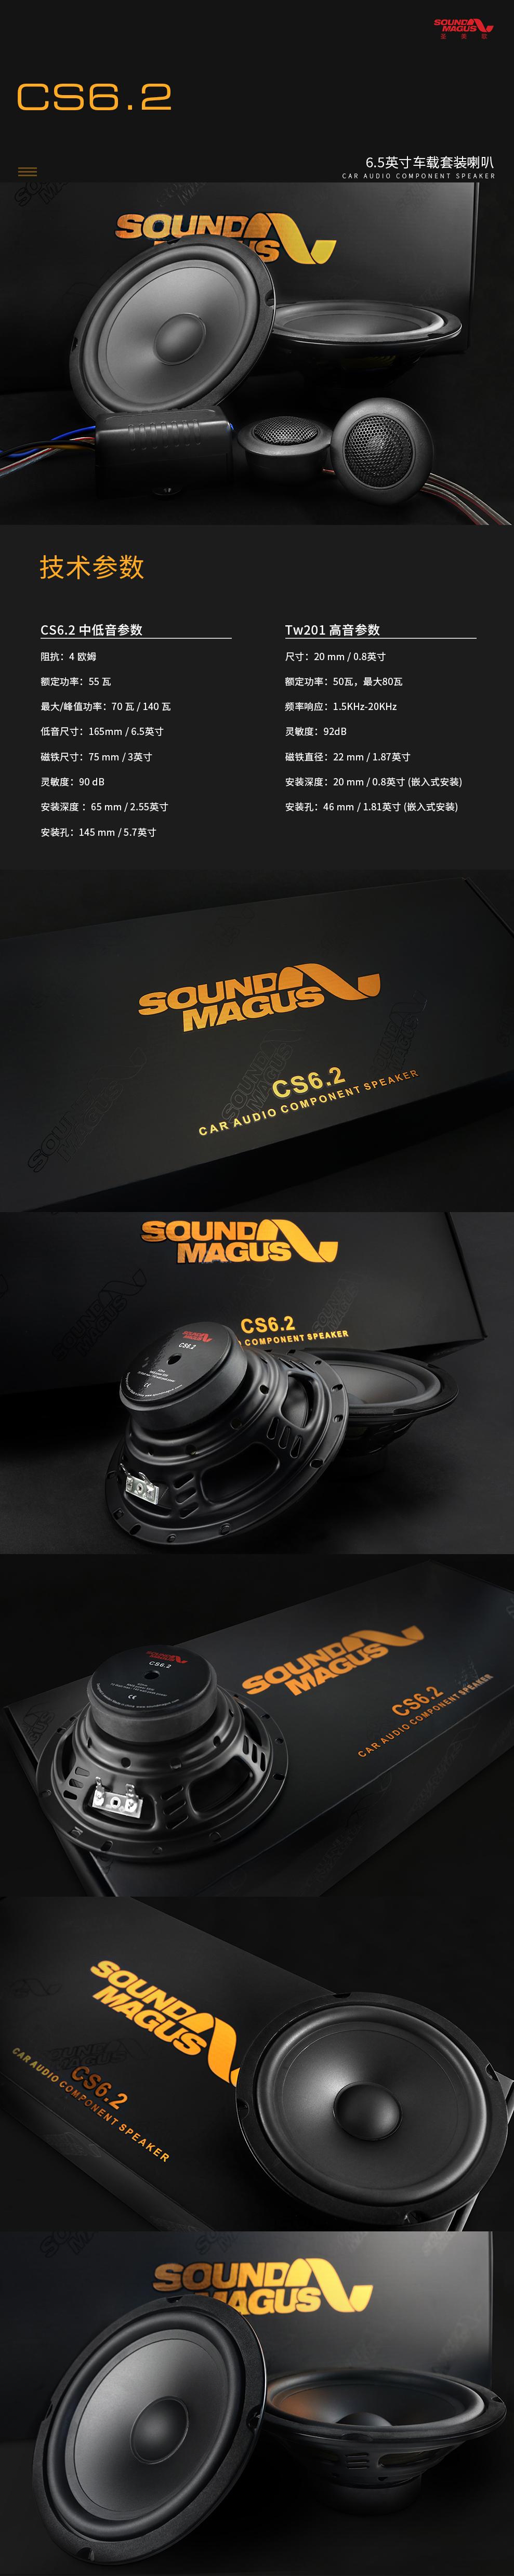 CS6.2